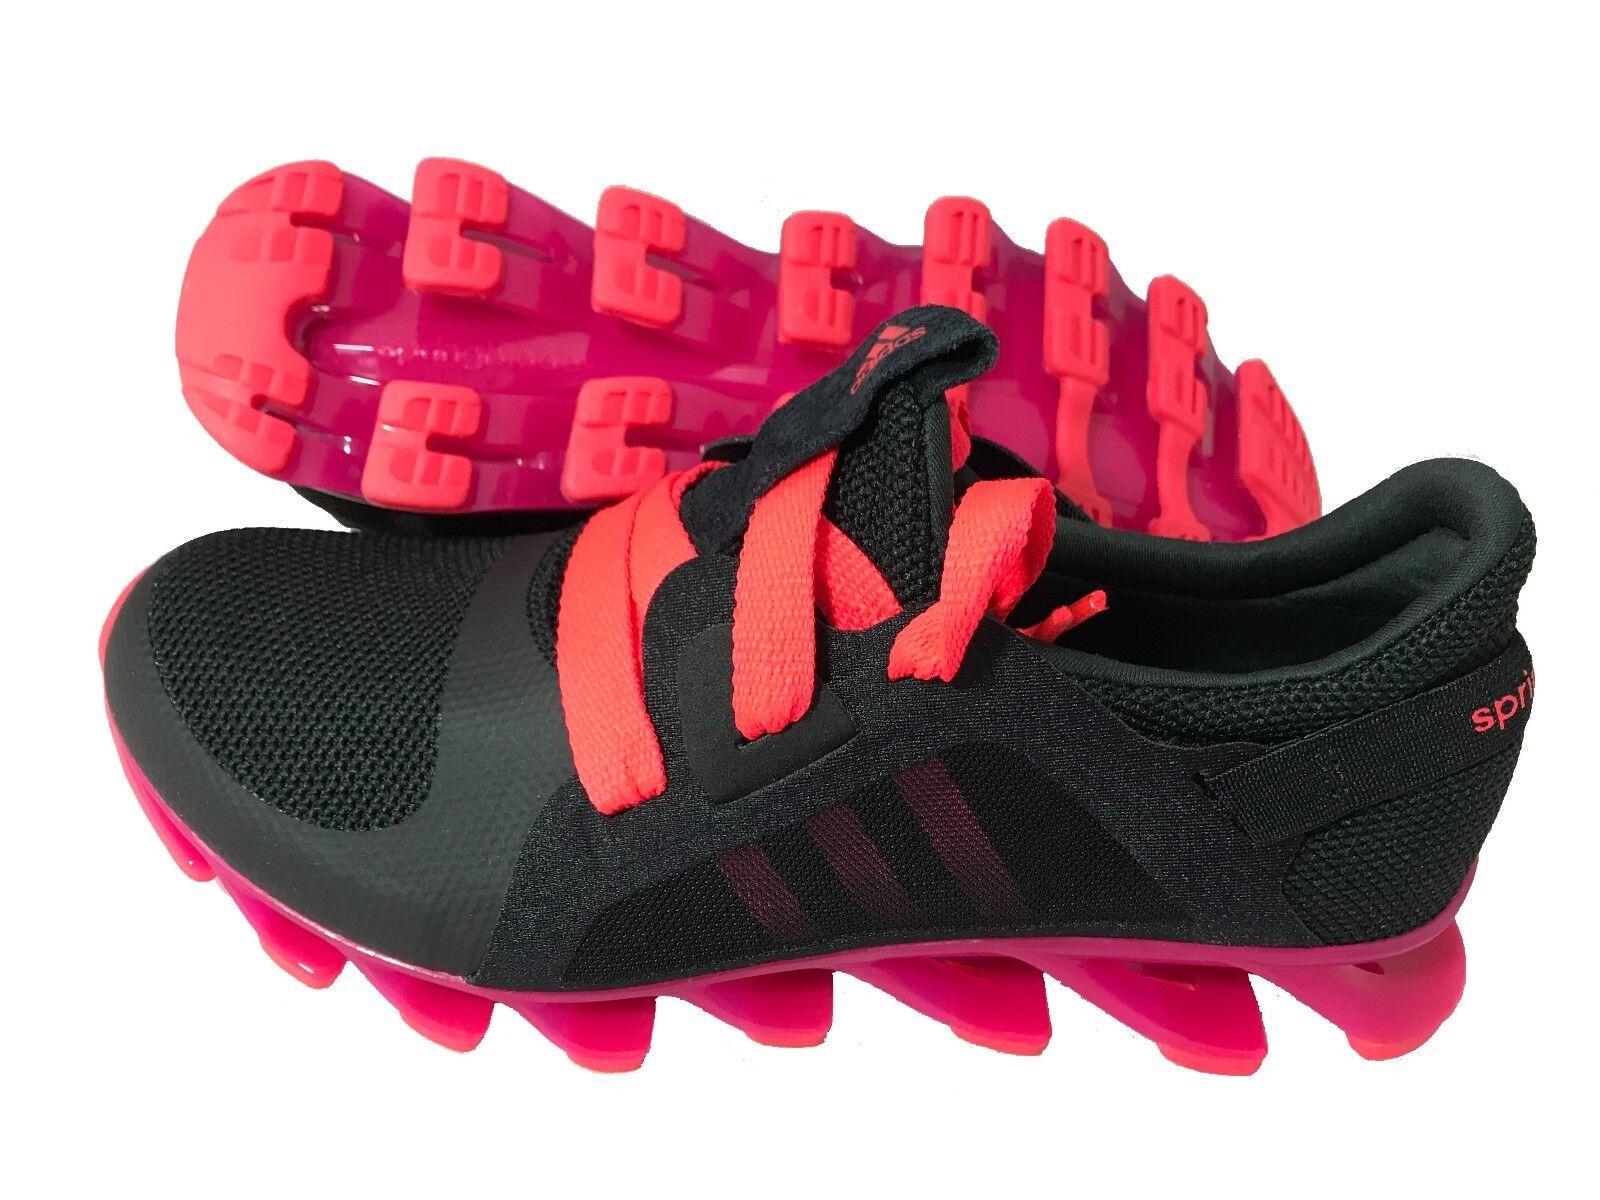 Adidas Springblade Nanaya Damenschuhe Running Schuhes Trainers